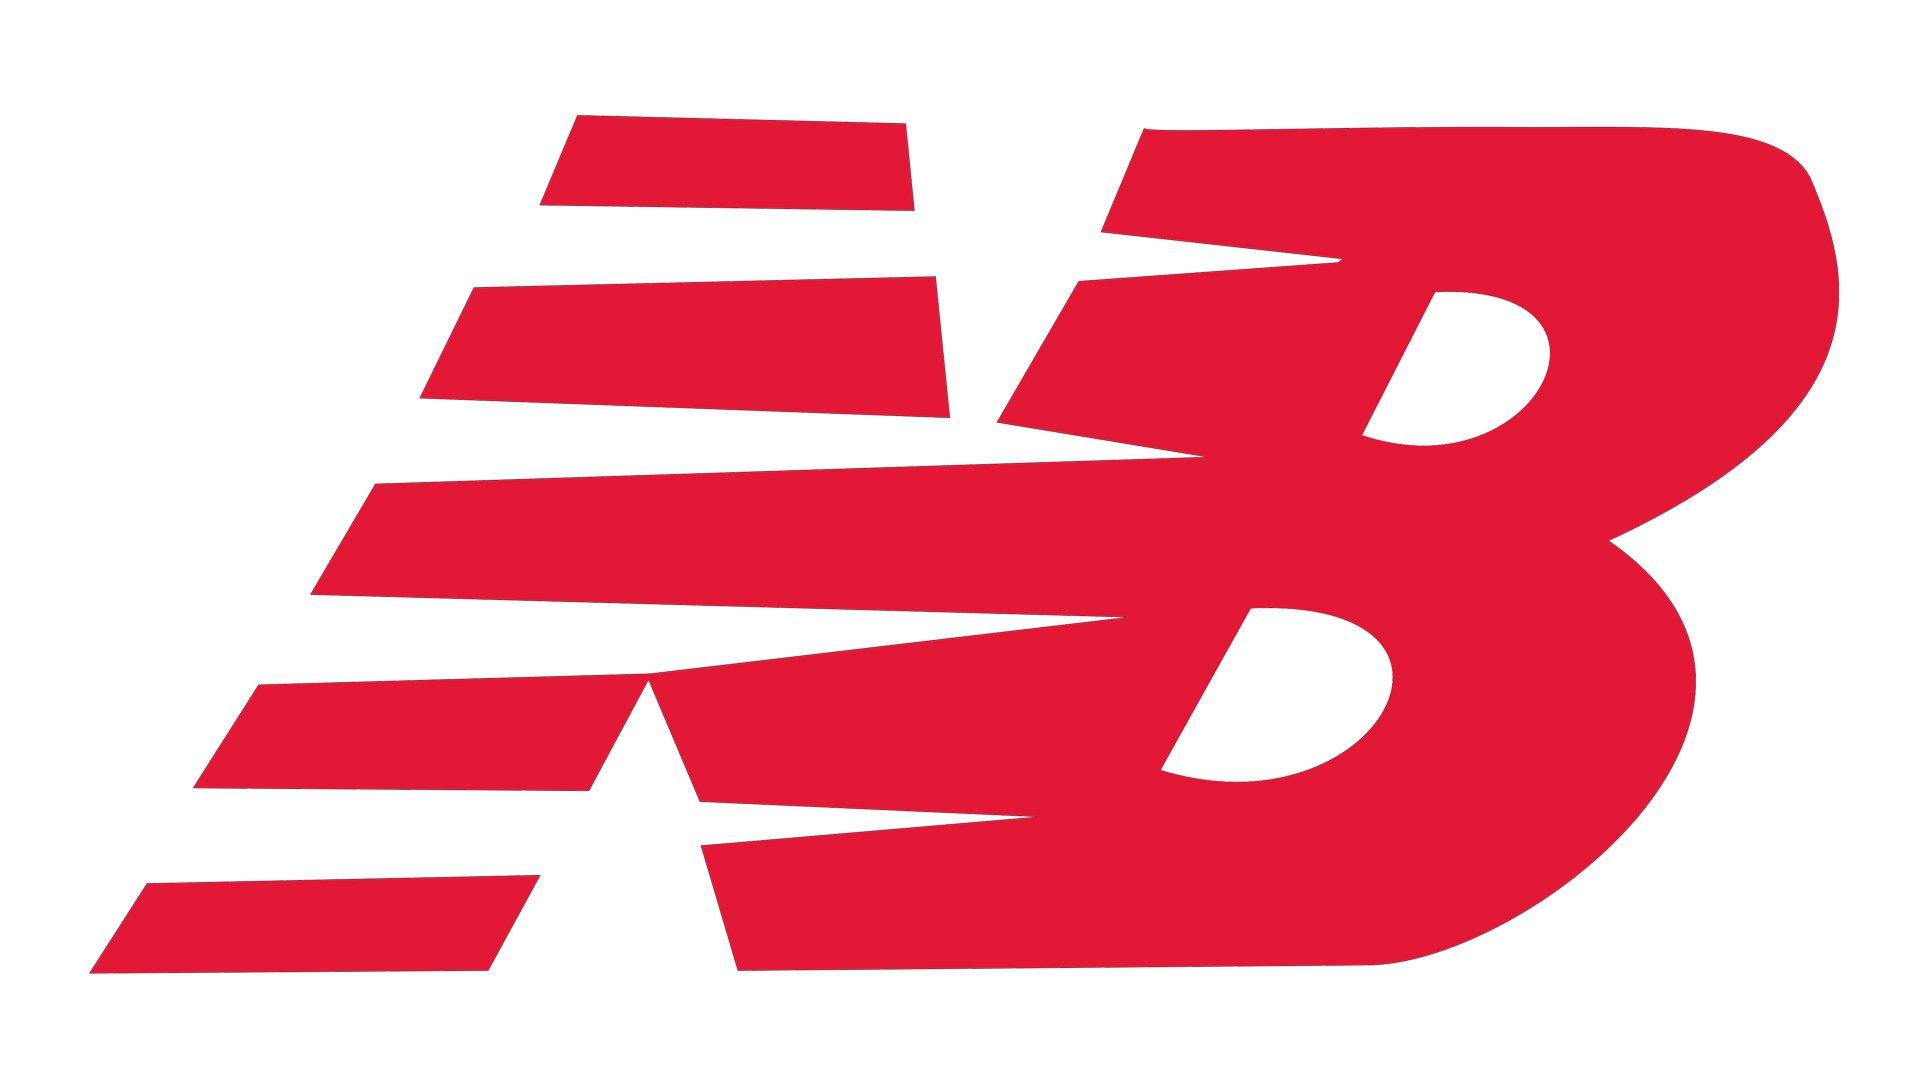 Consejos Ingenieros Paloma  New Balance logo and symbol, meaning, history, PNG